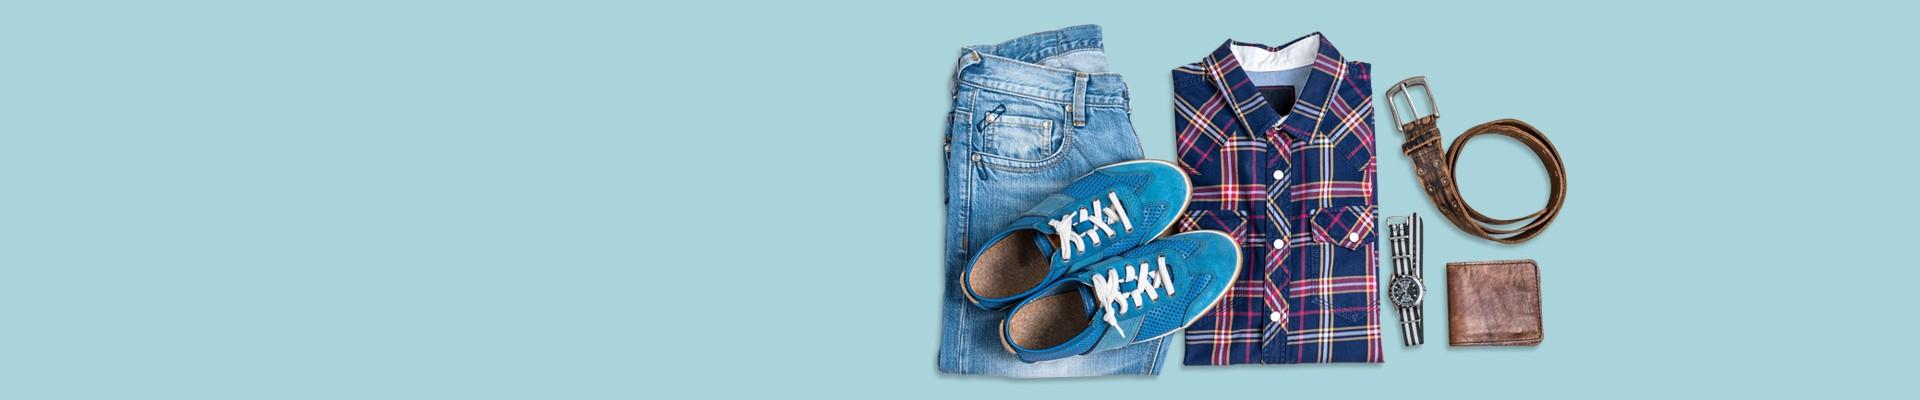 Inspirasi Fashion Pria Terkini - Koleksi Terbaru